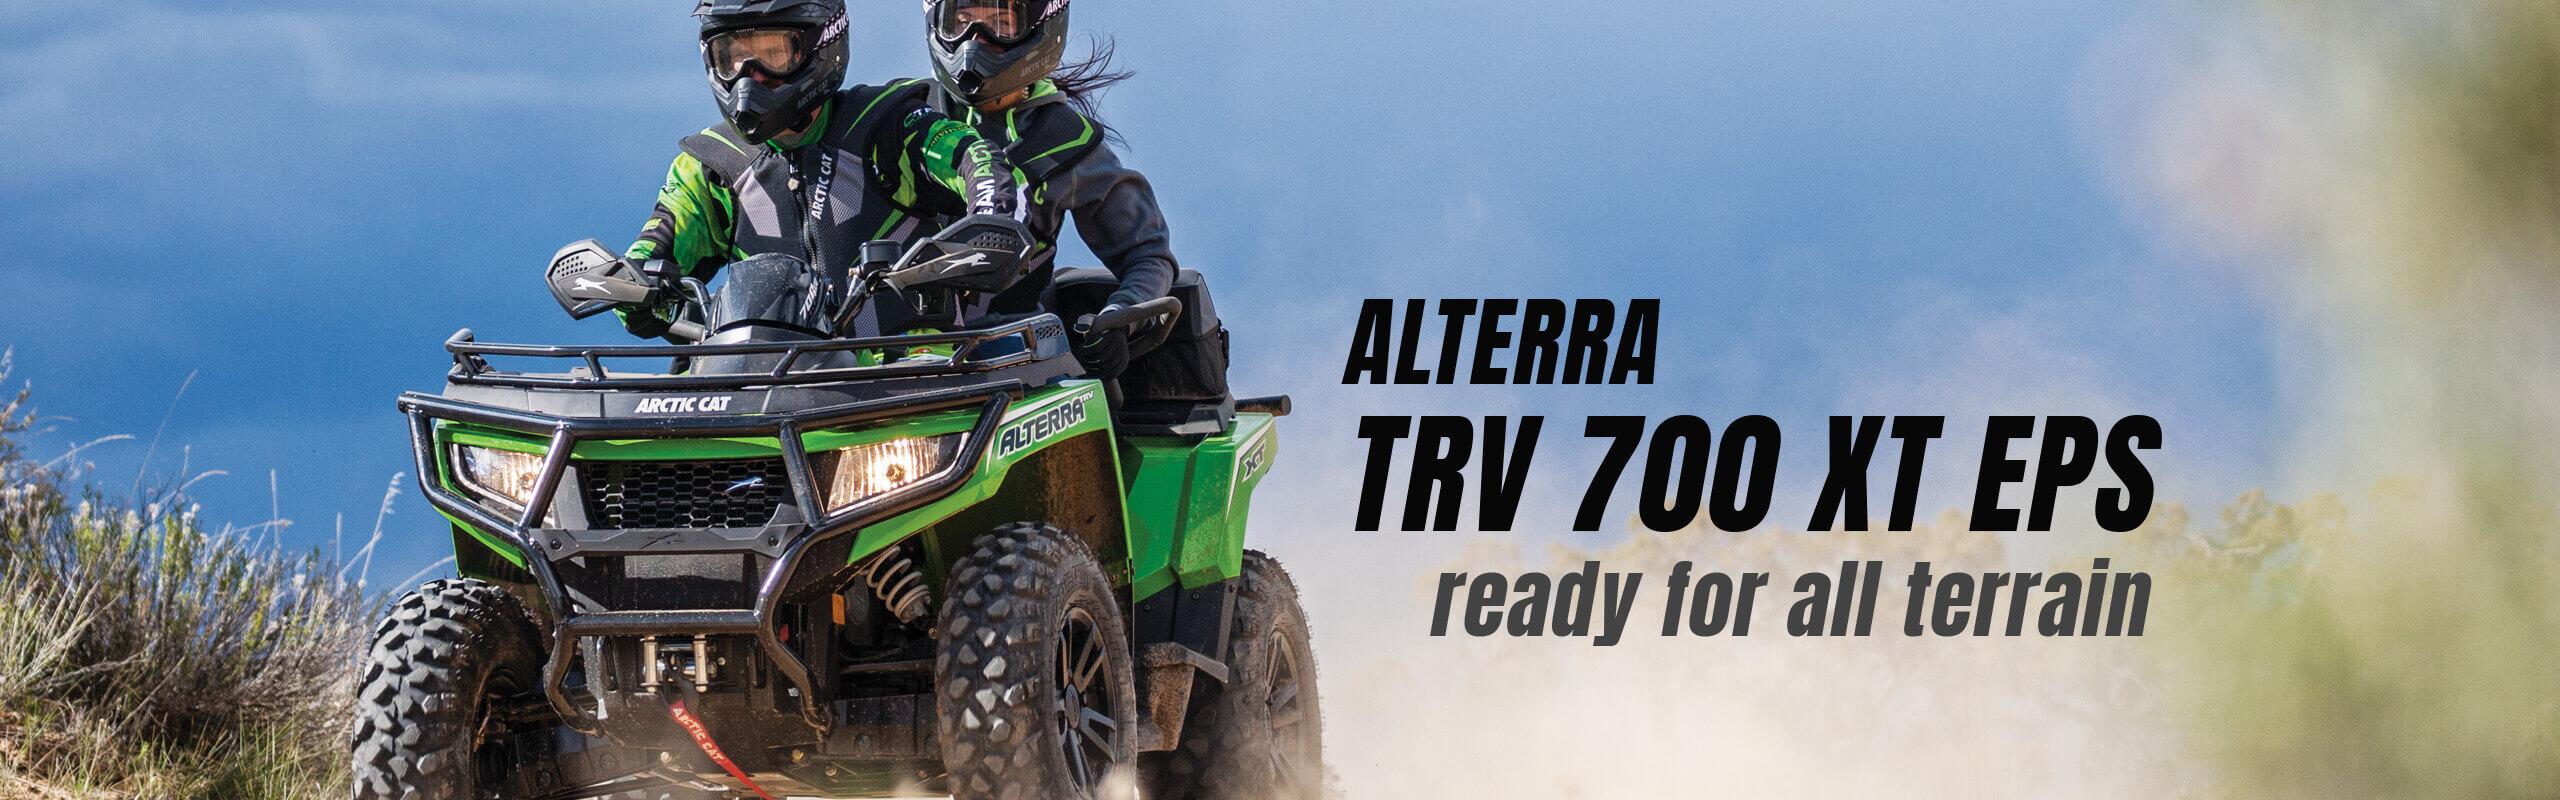 Alterra TRV700 XT